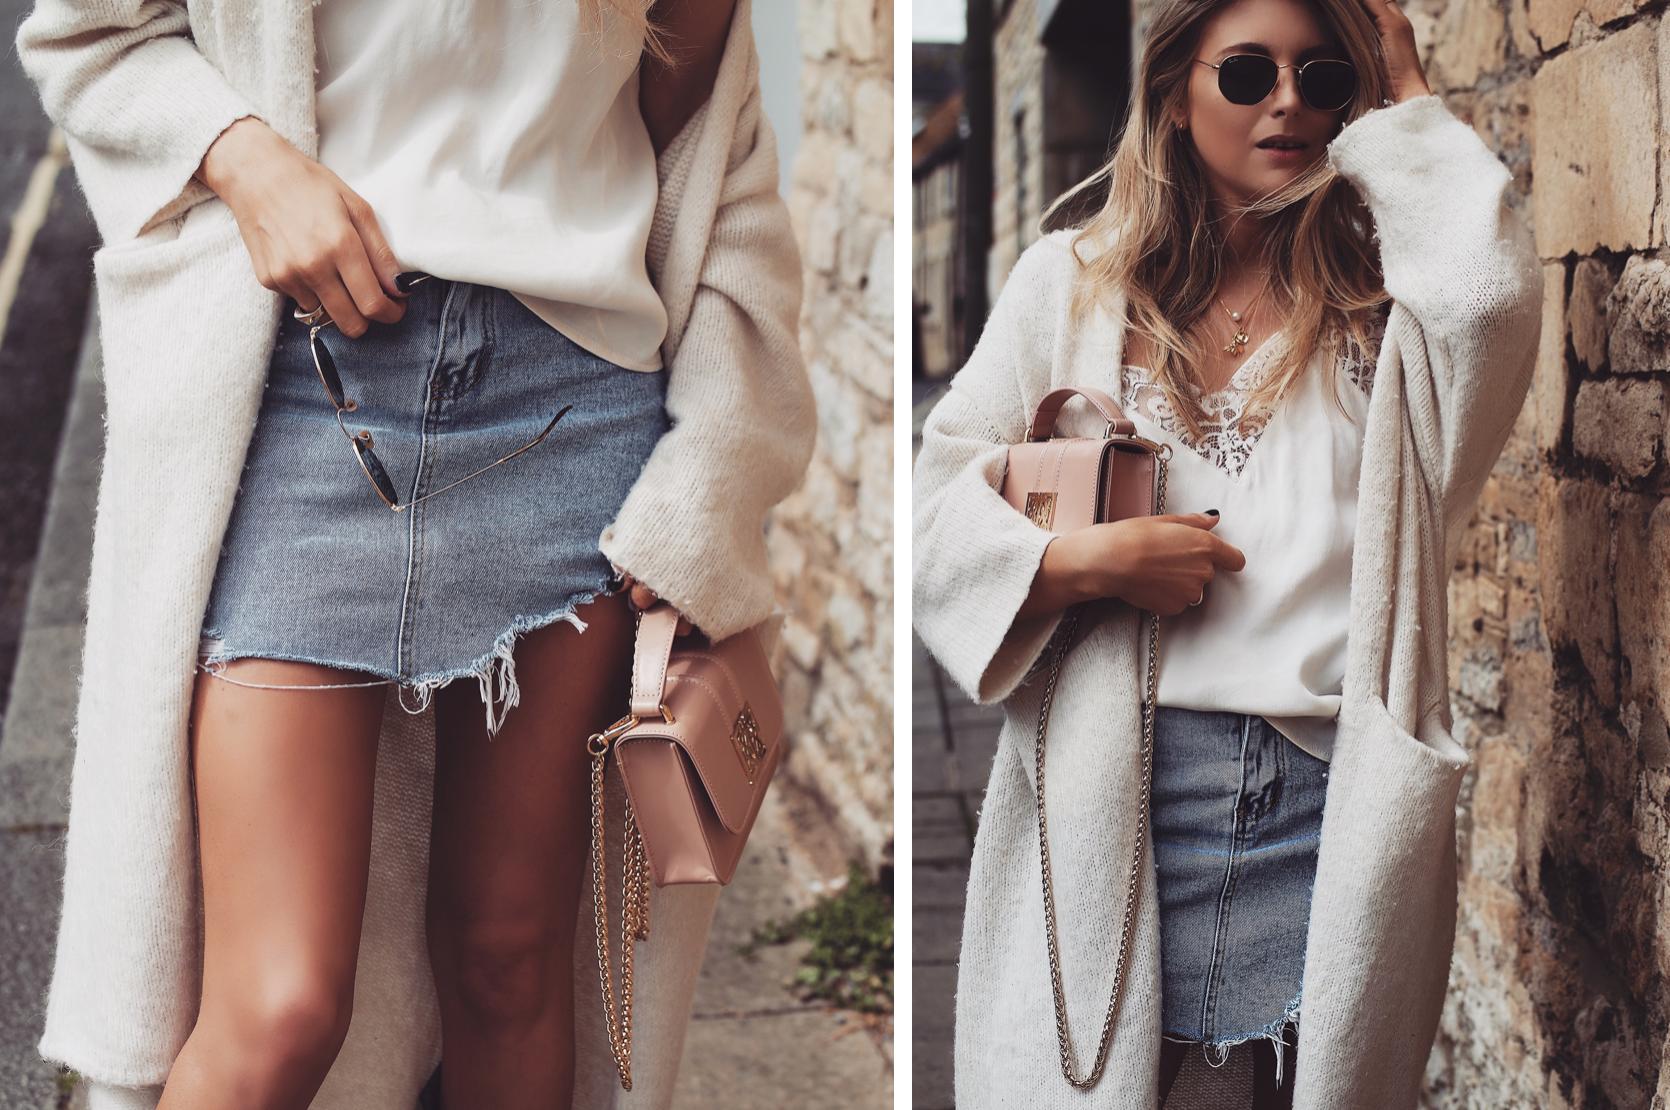 Jewel Street Fashion Blogger Street Style Love Style Mindfulness Fashion Personal Style Blog